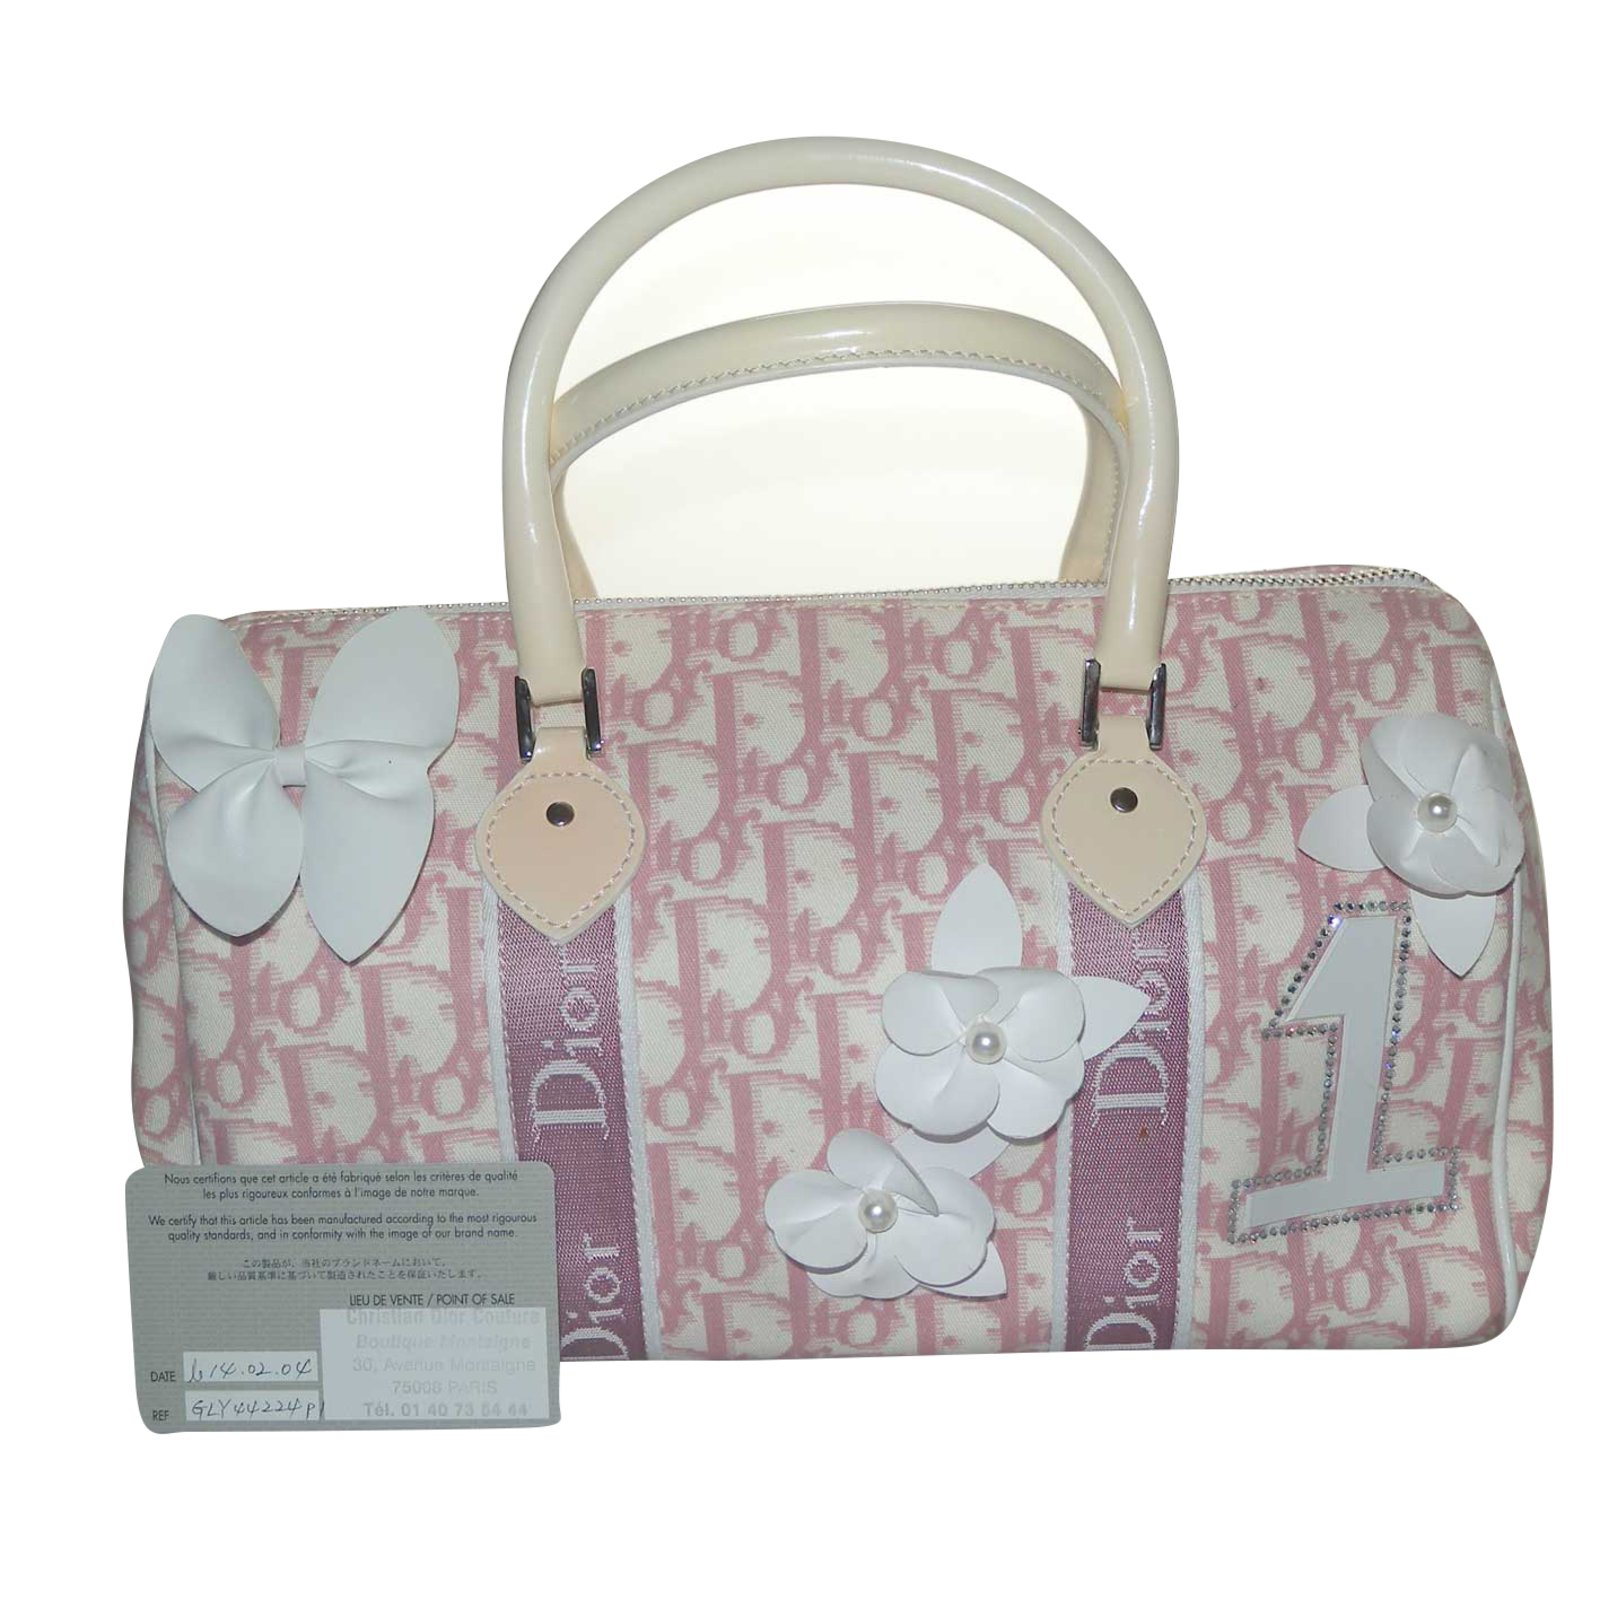 3b918a835cda Christian Dior Handbags Handbags Patent leather